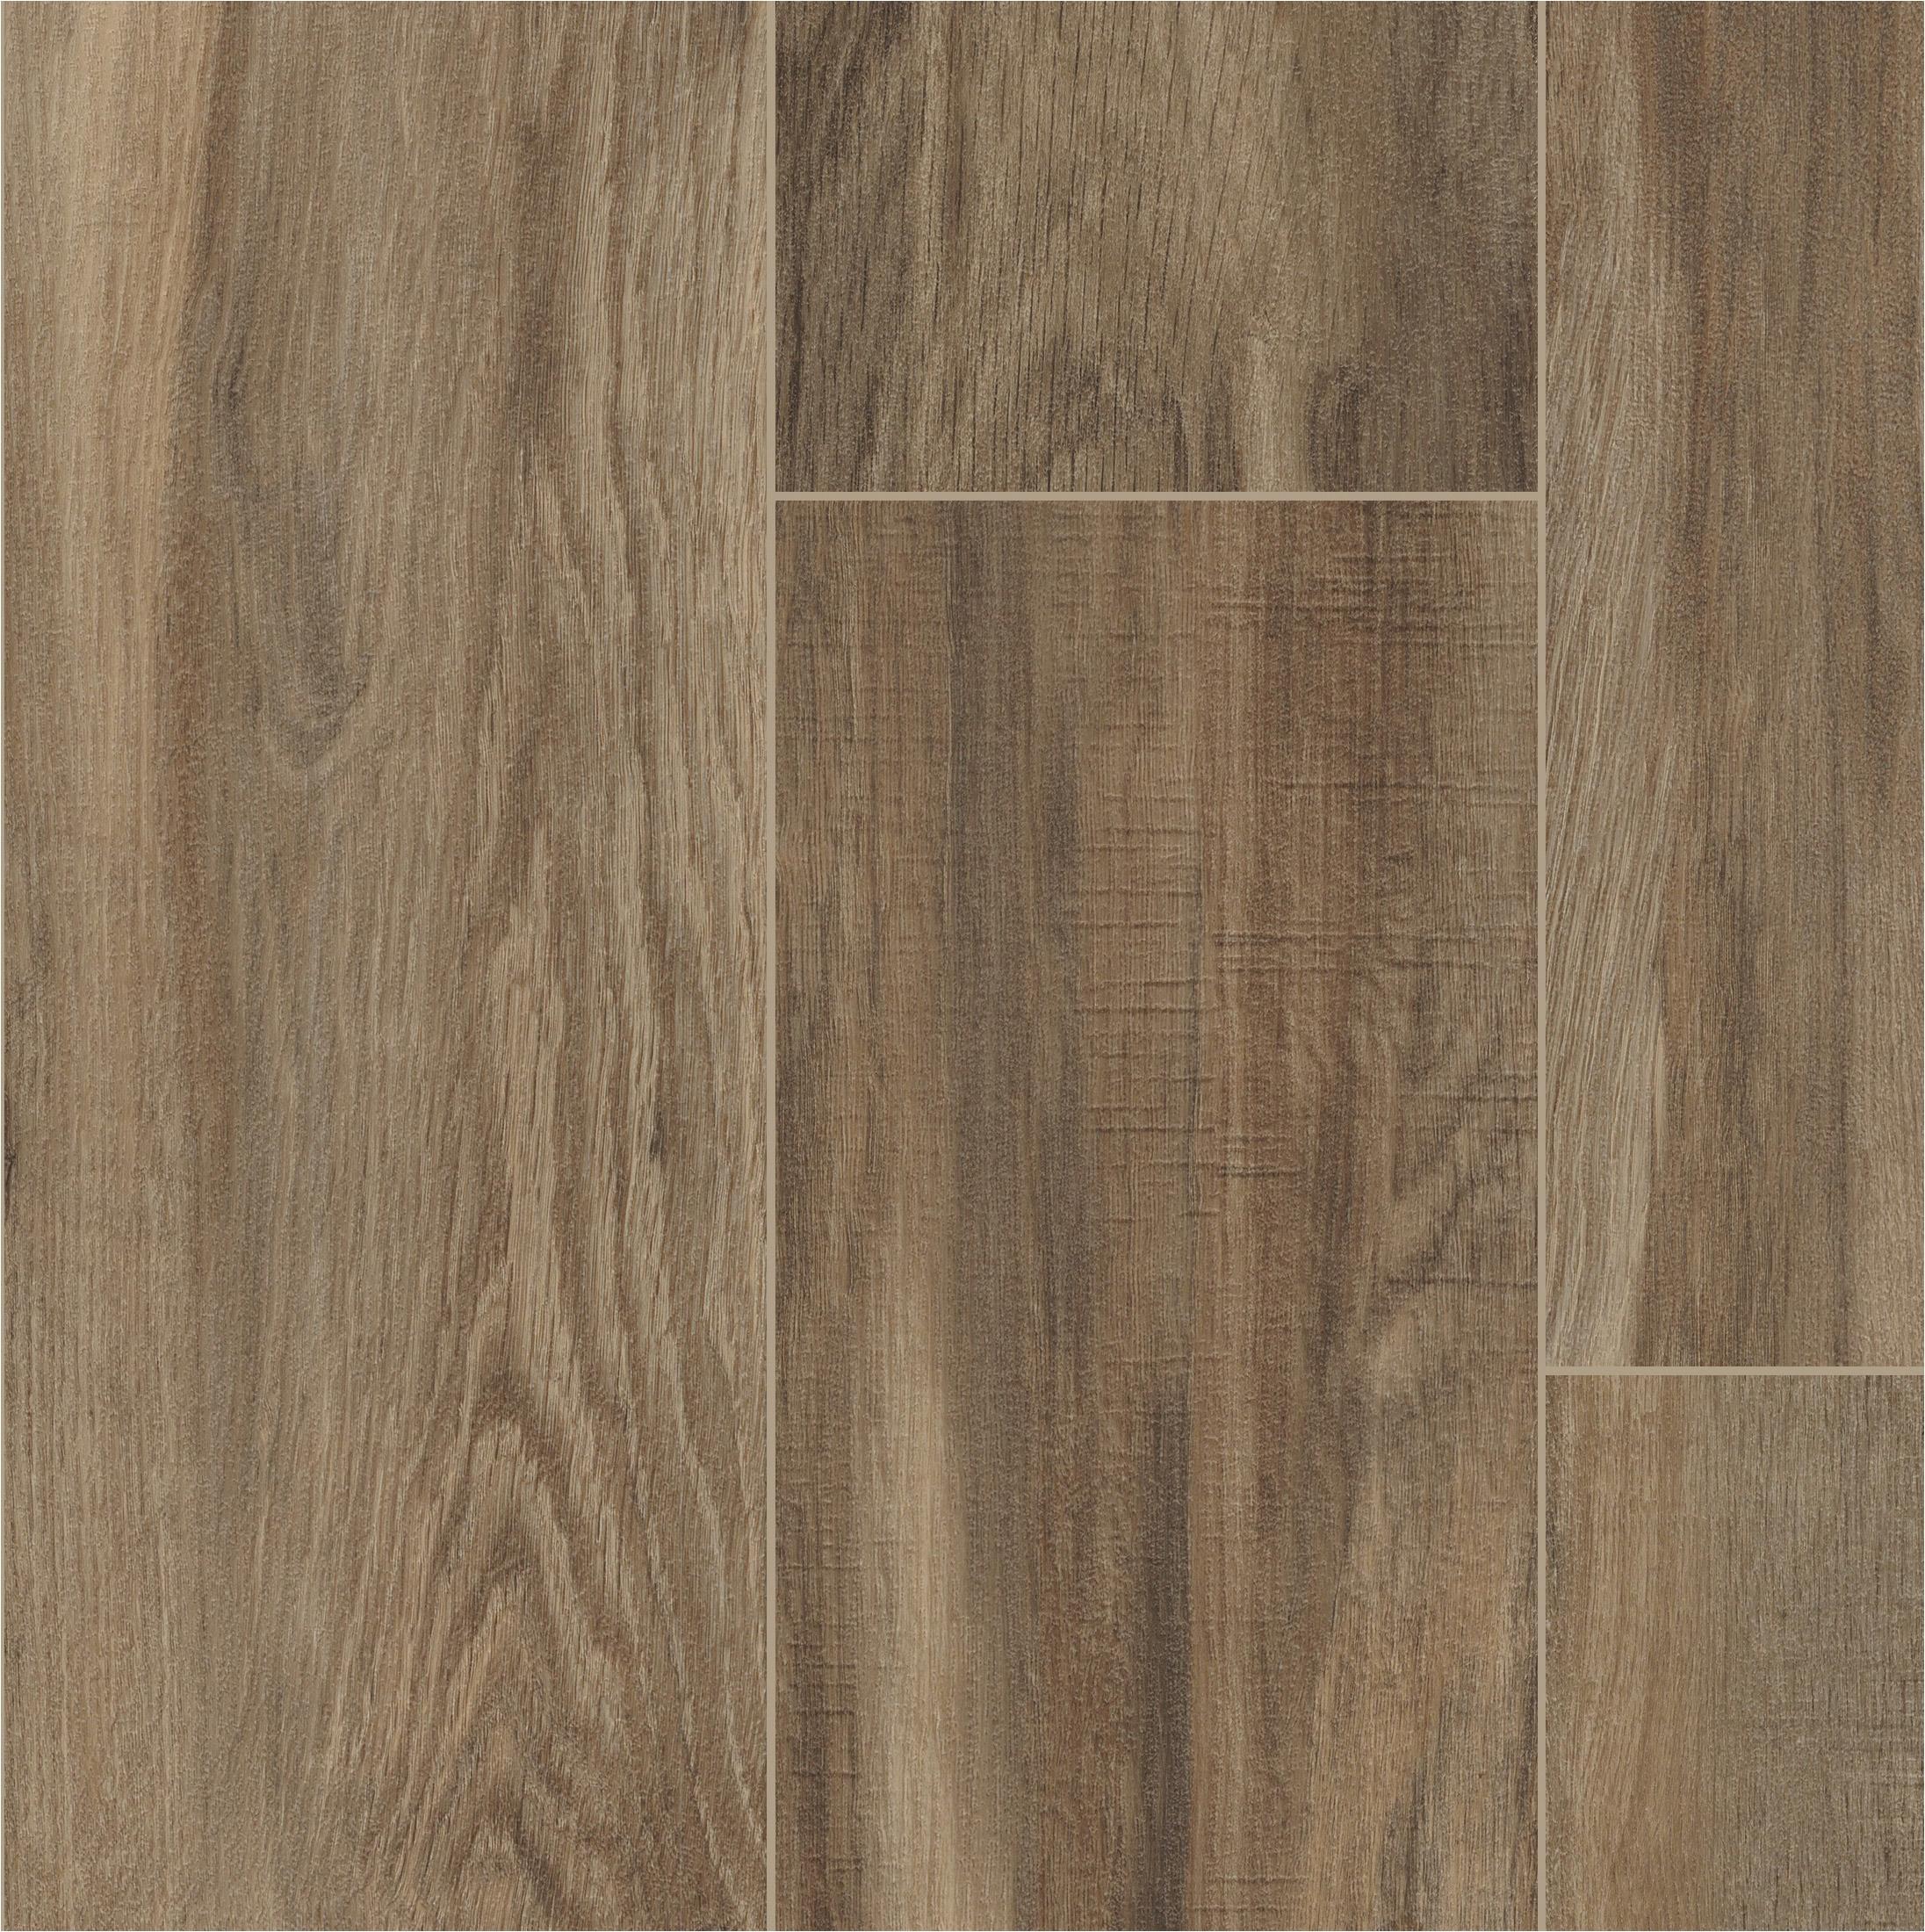 Best Luxury Vinyl Plank Flooring Brands Mohawk Amber 9 Wide Glue Down Luxury Vinyl Plank Flooring